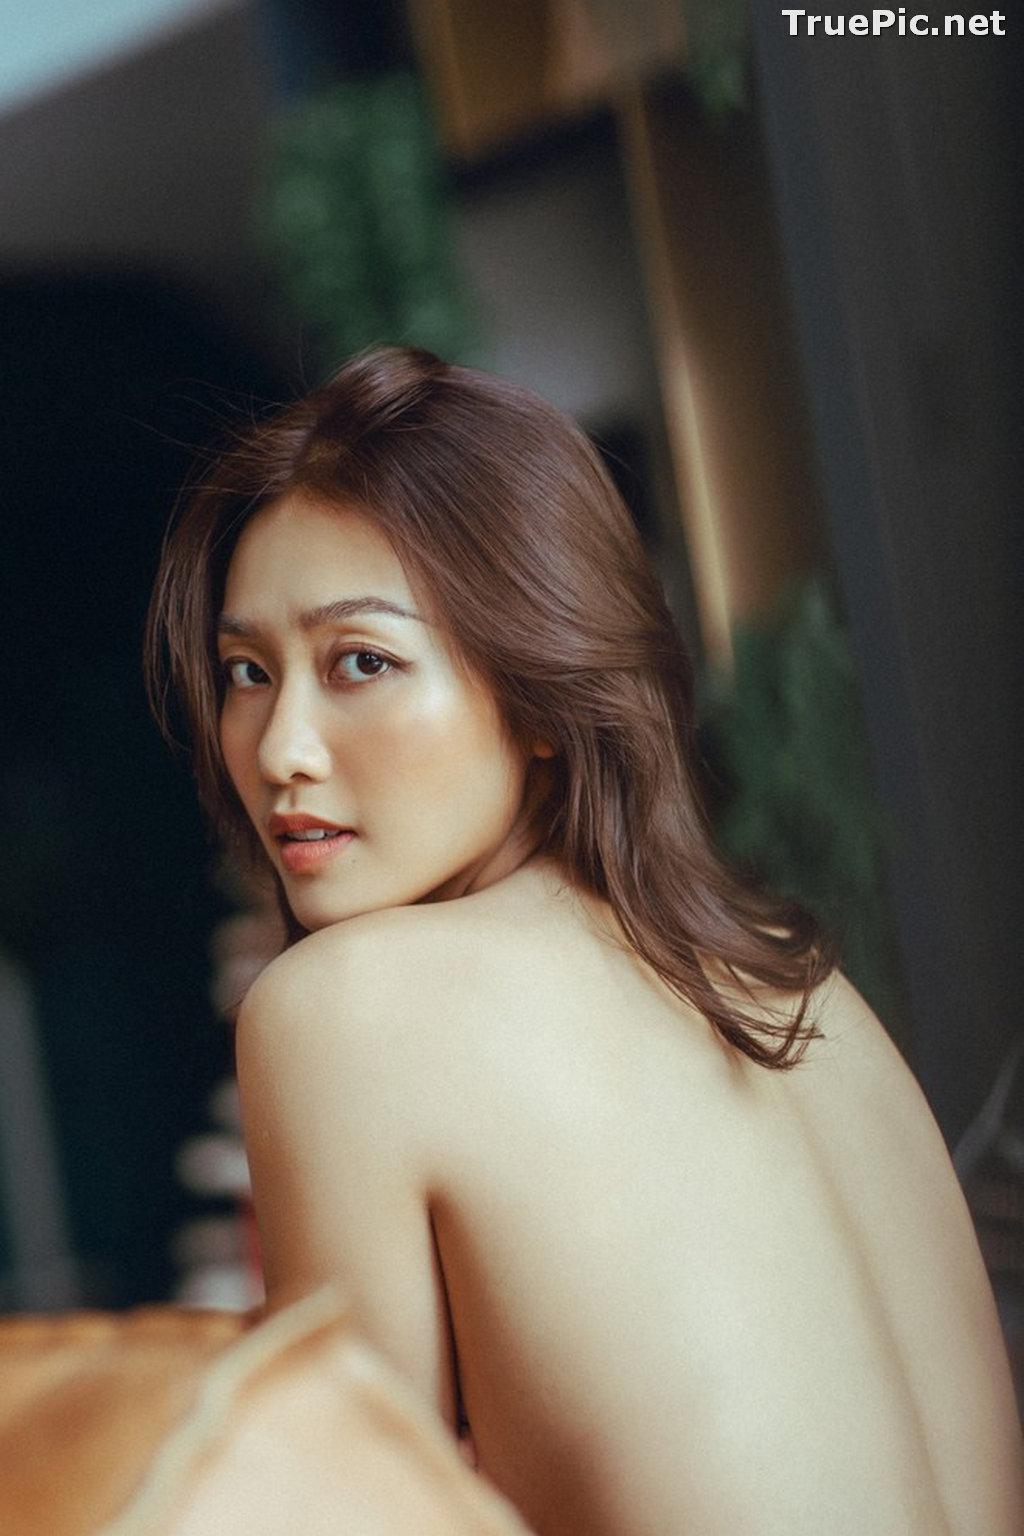 Image Vietnamese Hot Girl - Kha Ngan - Gentle Young Charming - TruePic.net - Picture-8